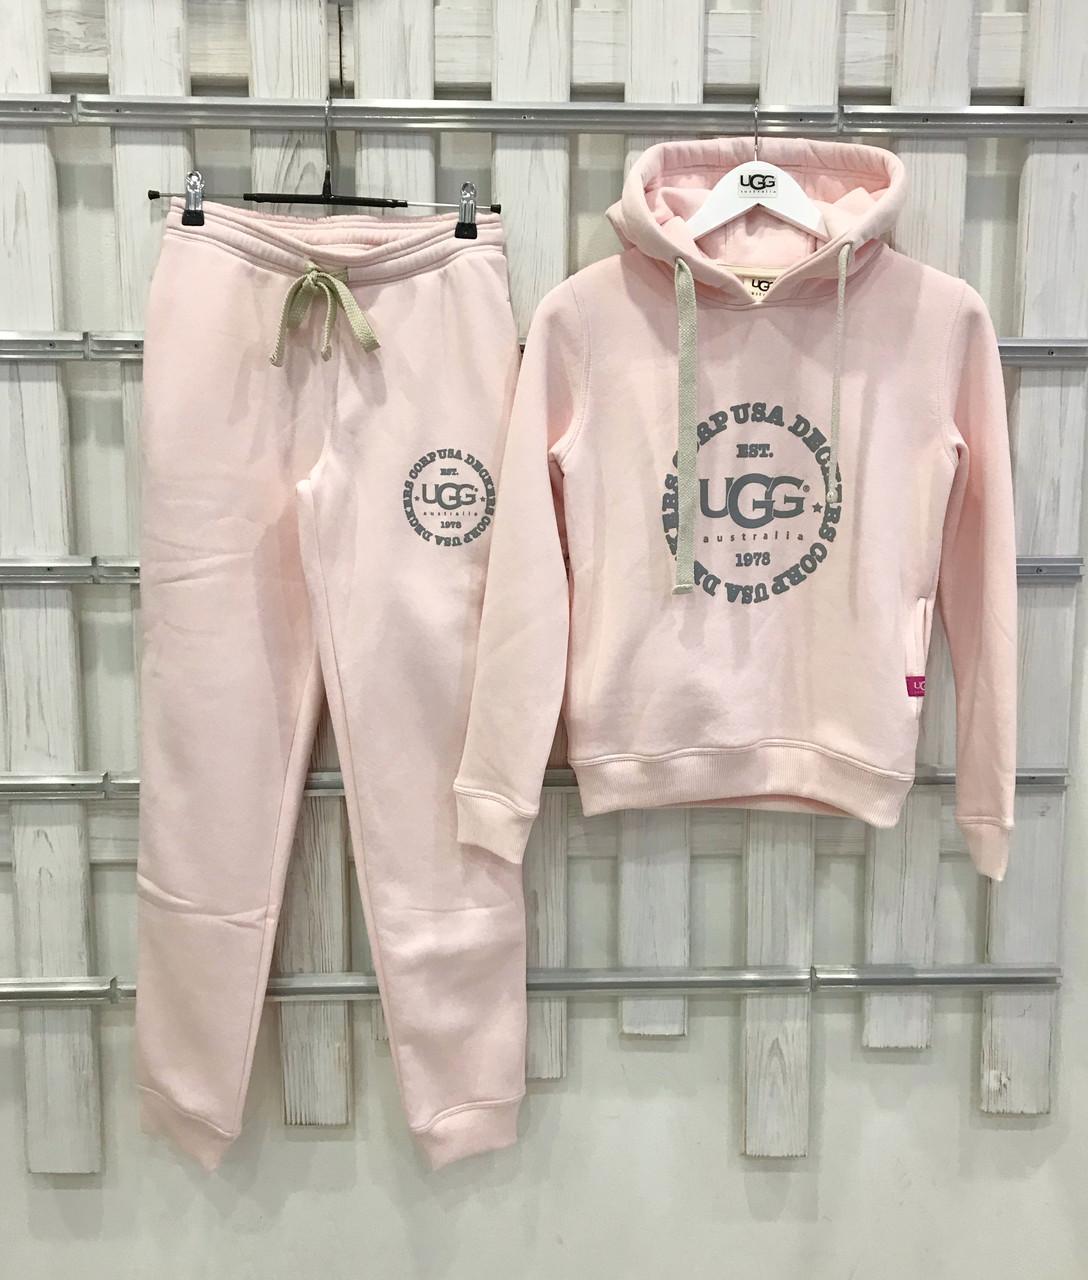 Теплый женский костюм от UGG Australia Print Classic Neck Hoodie Pink, бледно-розовый